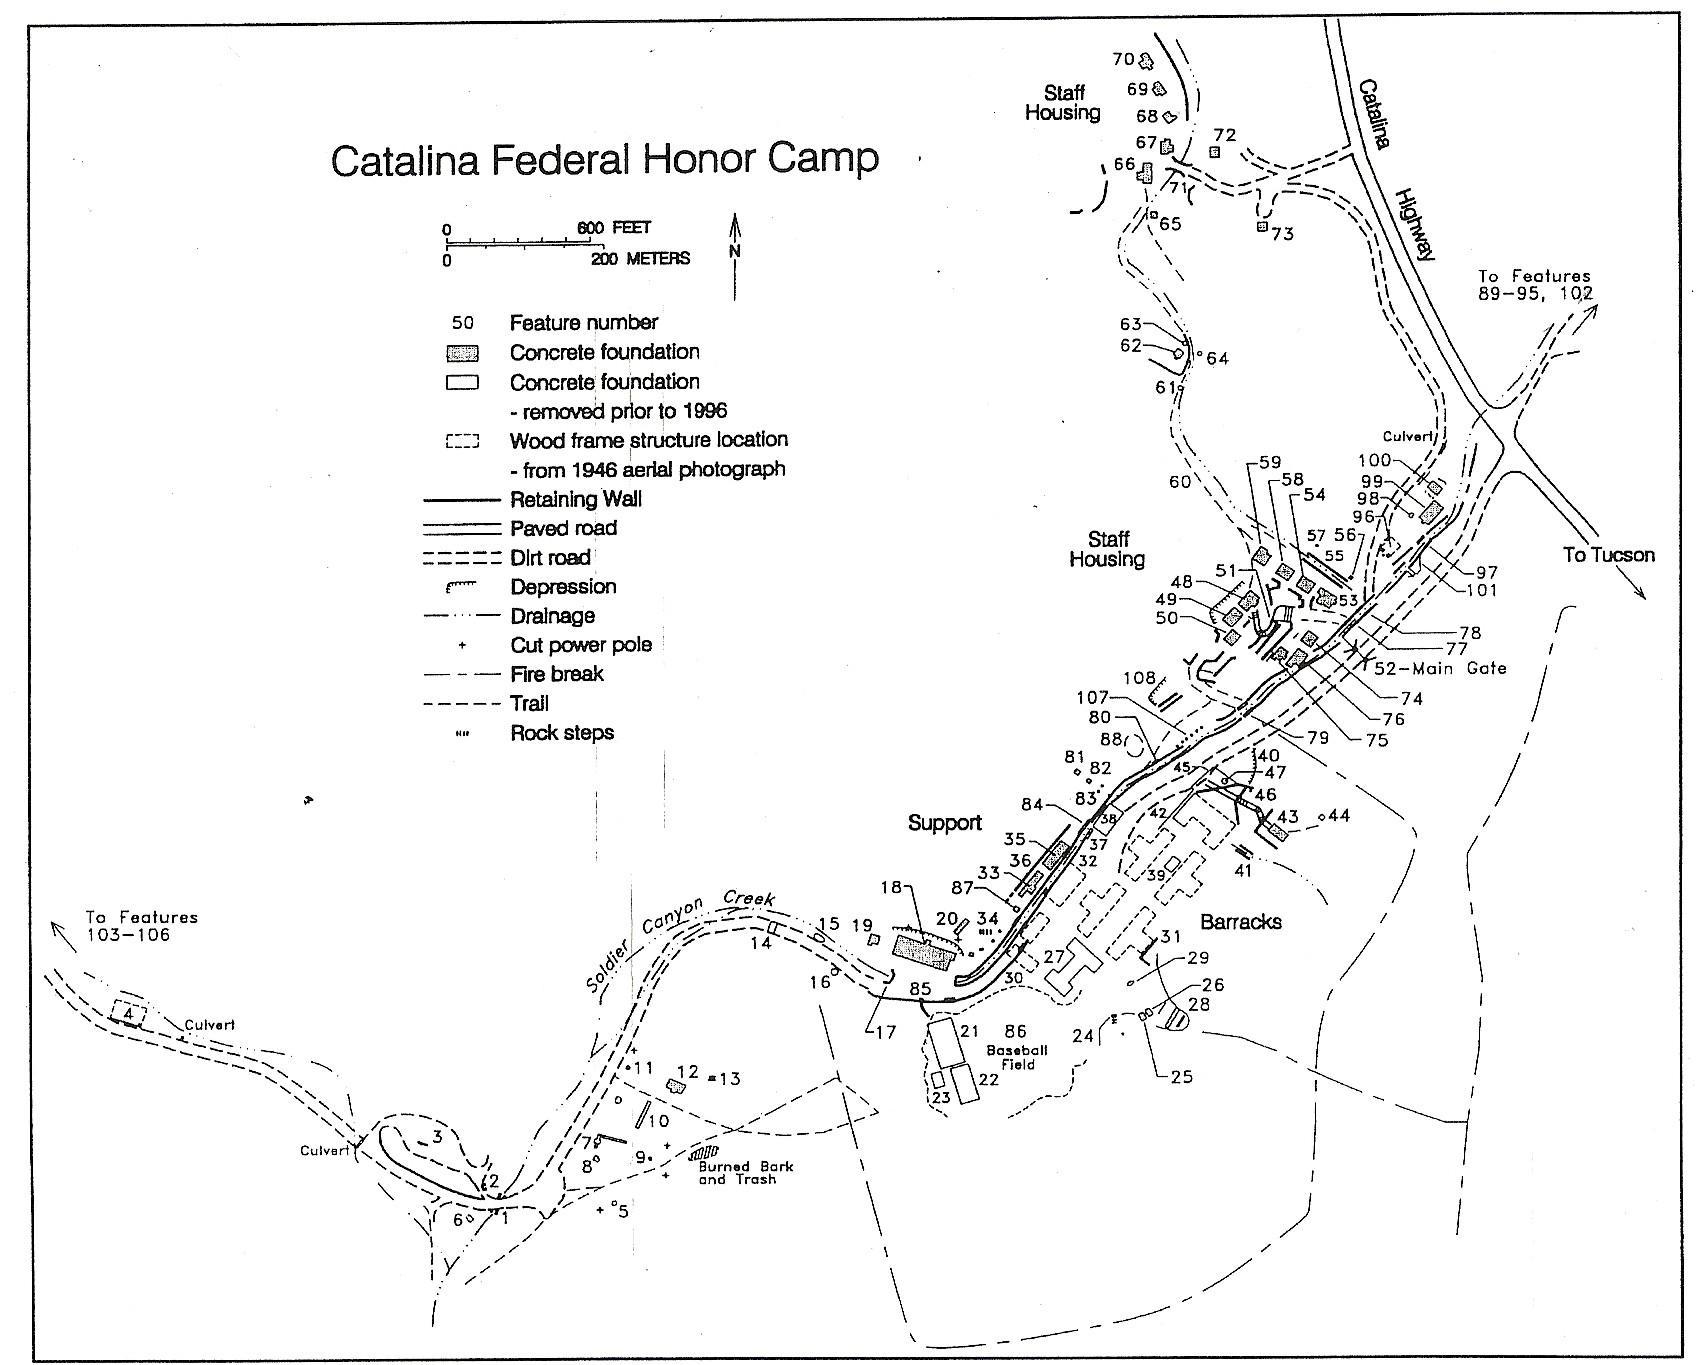 Tour of Prison Camp Historic Site